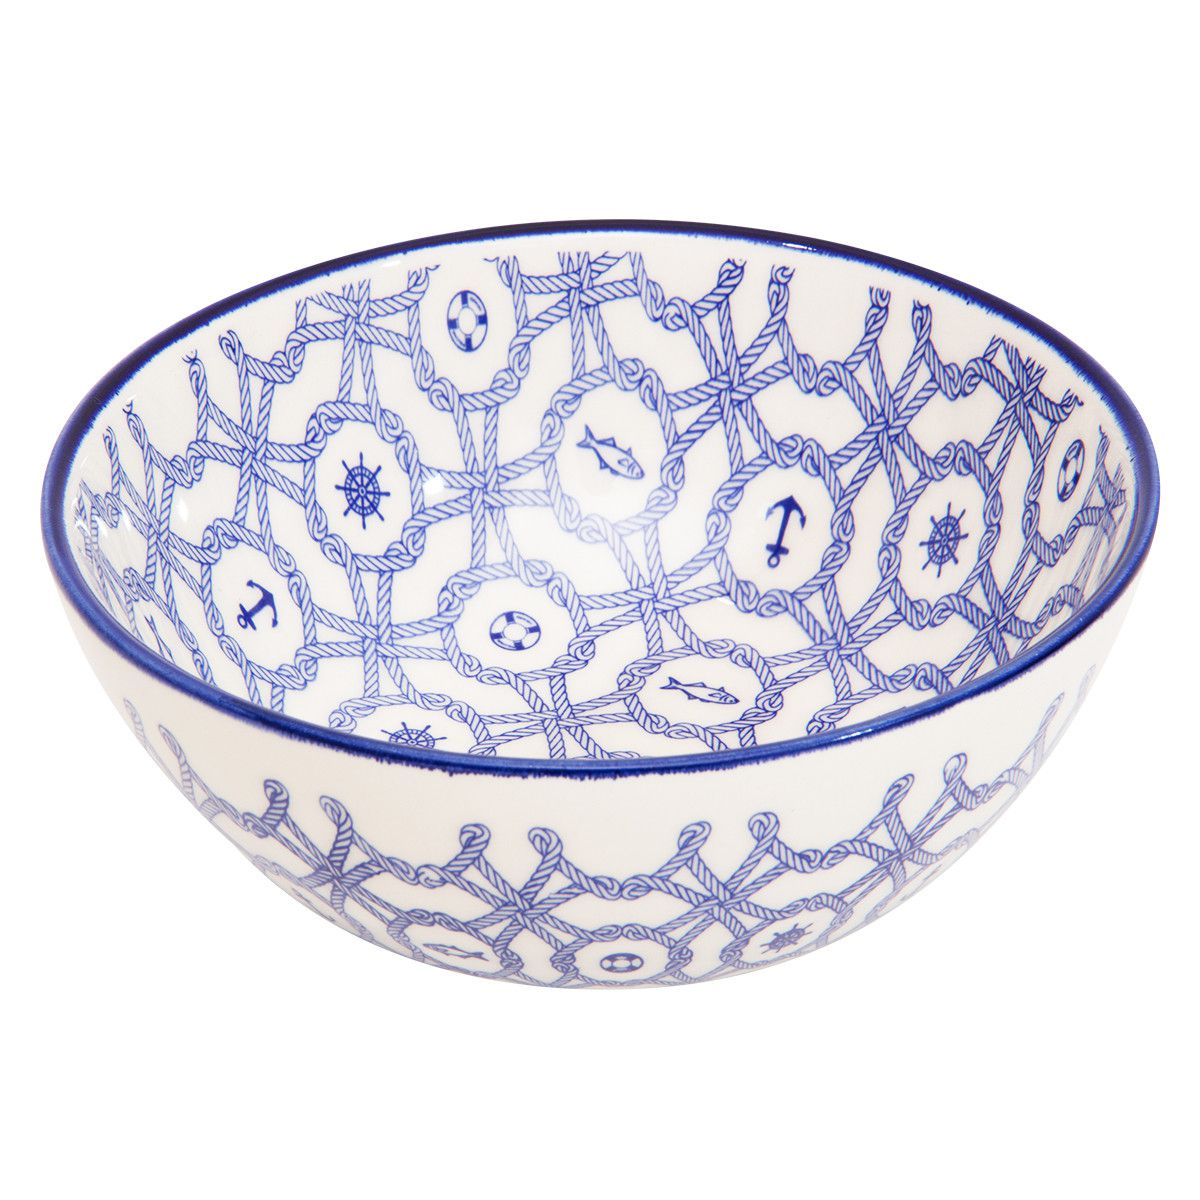 Tigela de Cerâmica Oxford Full Náutico 600ml AB37-6784